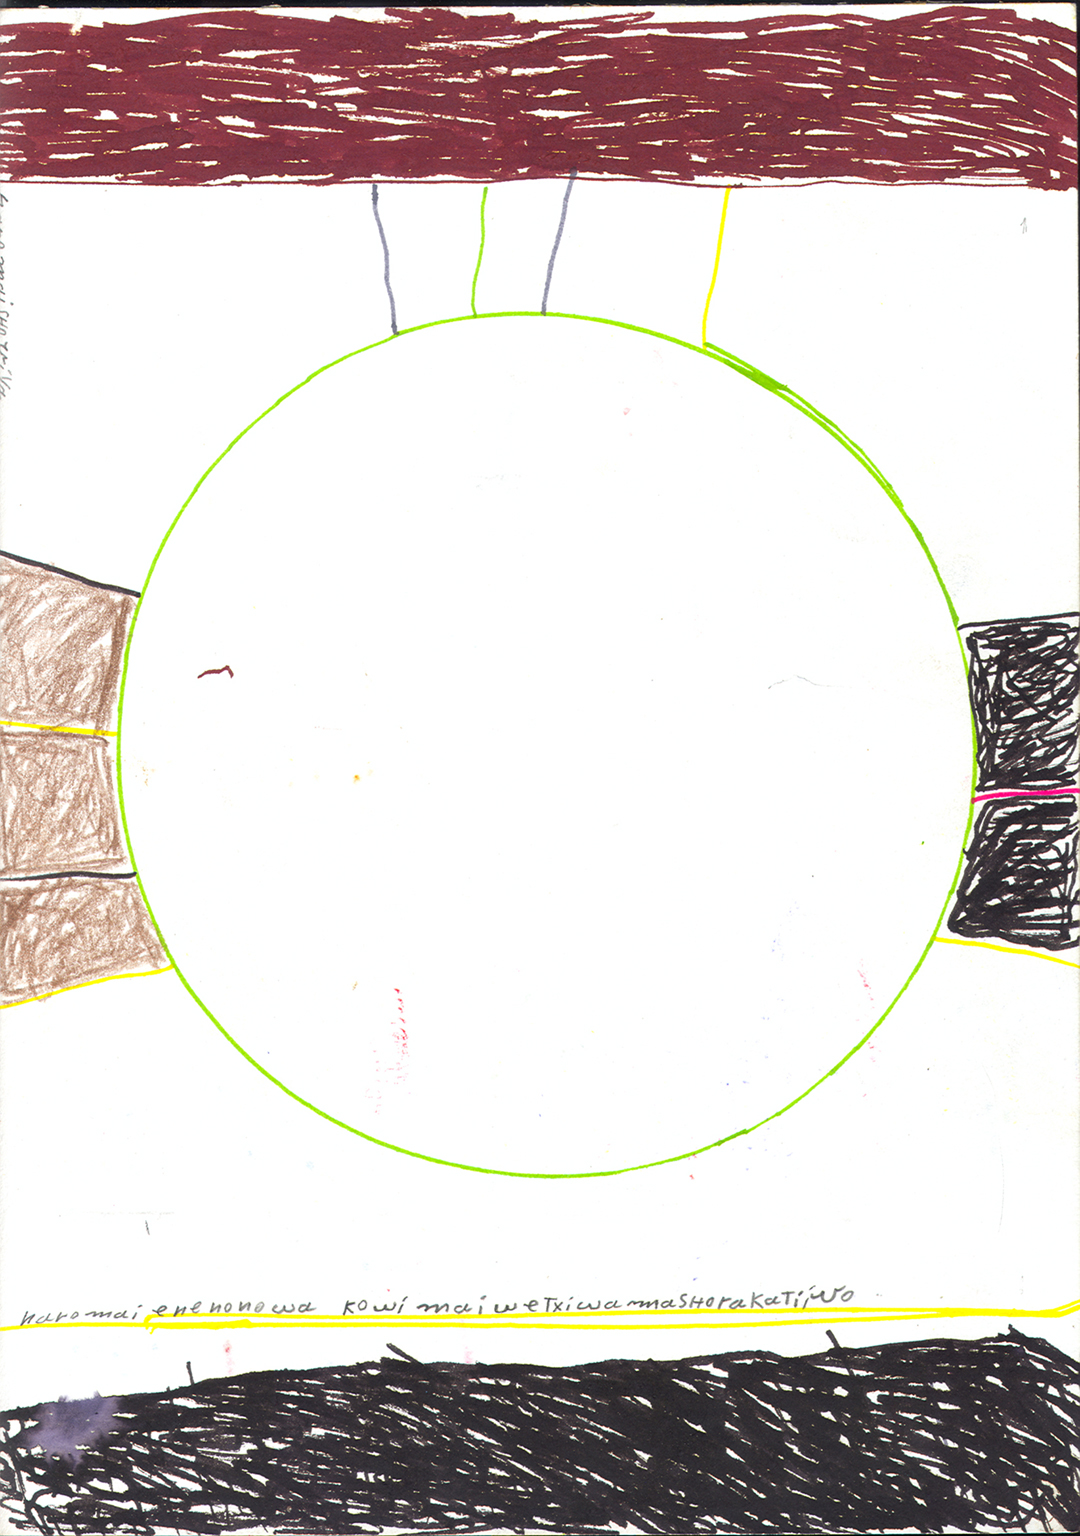 Pilares terrestres, 2005